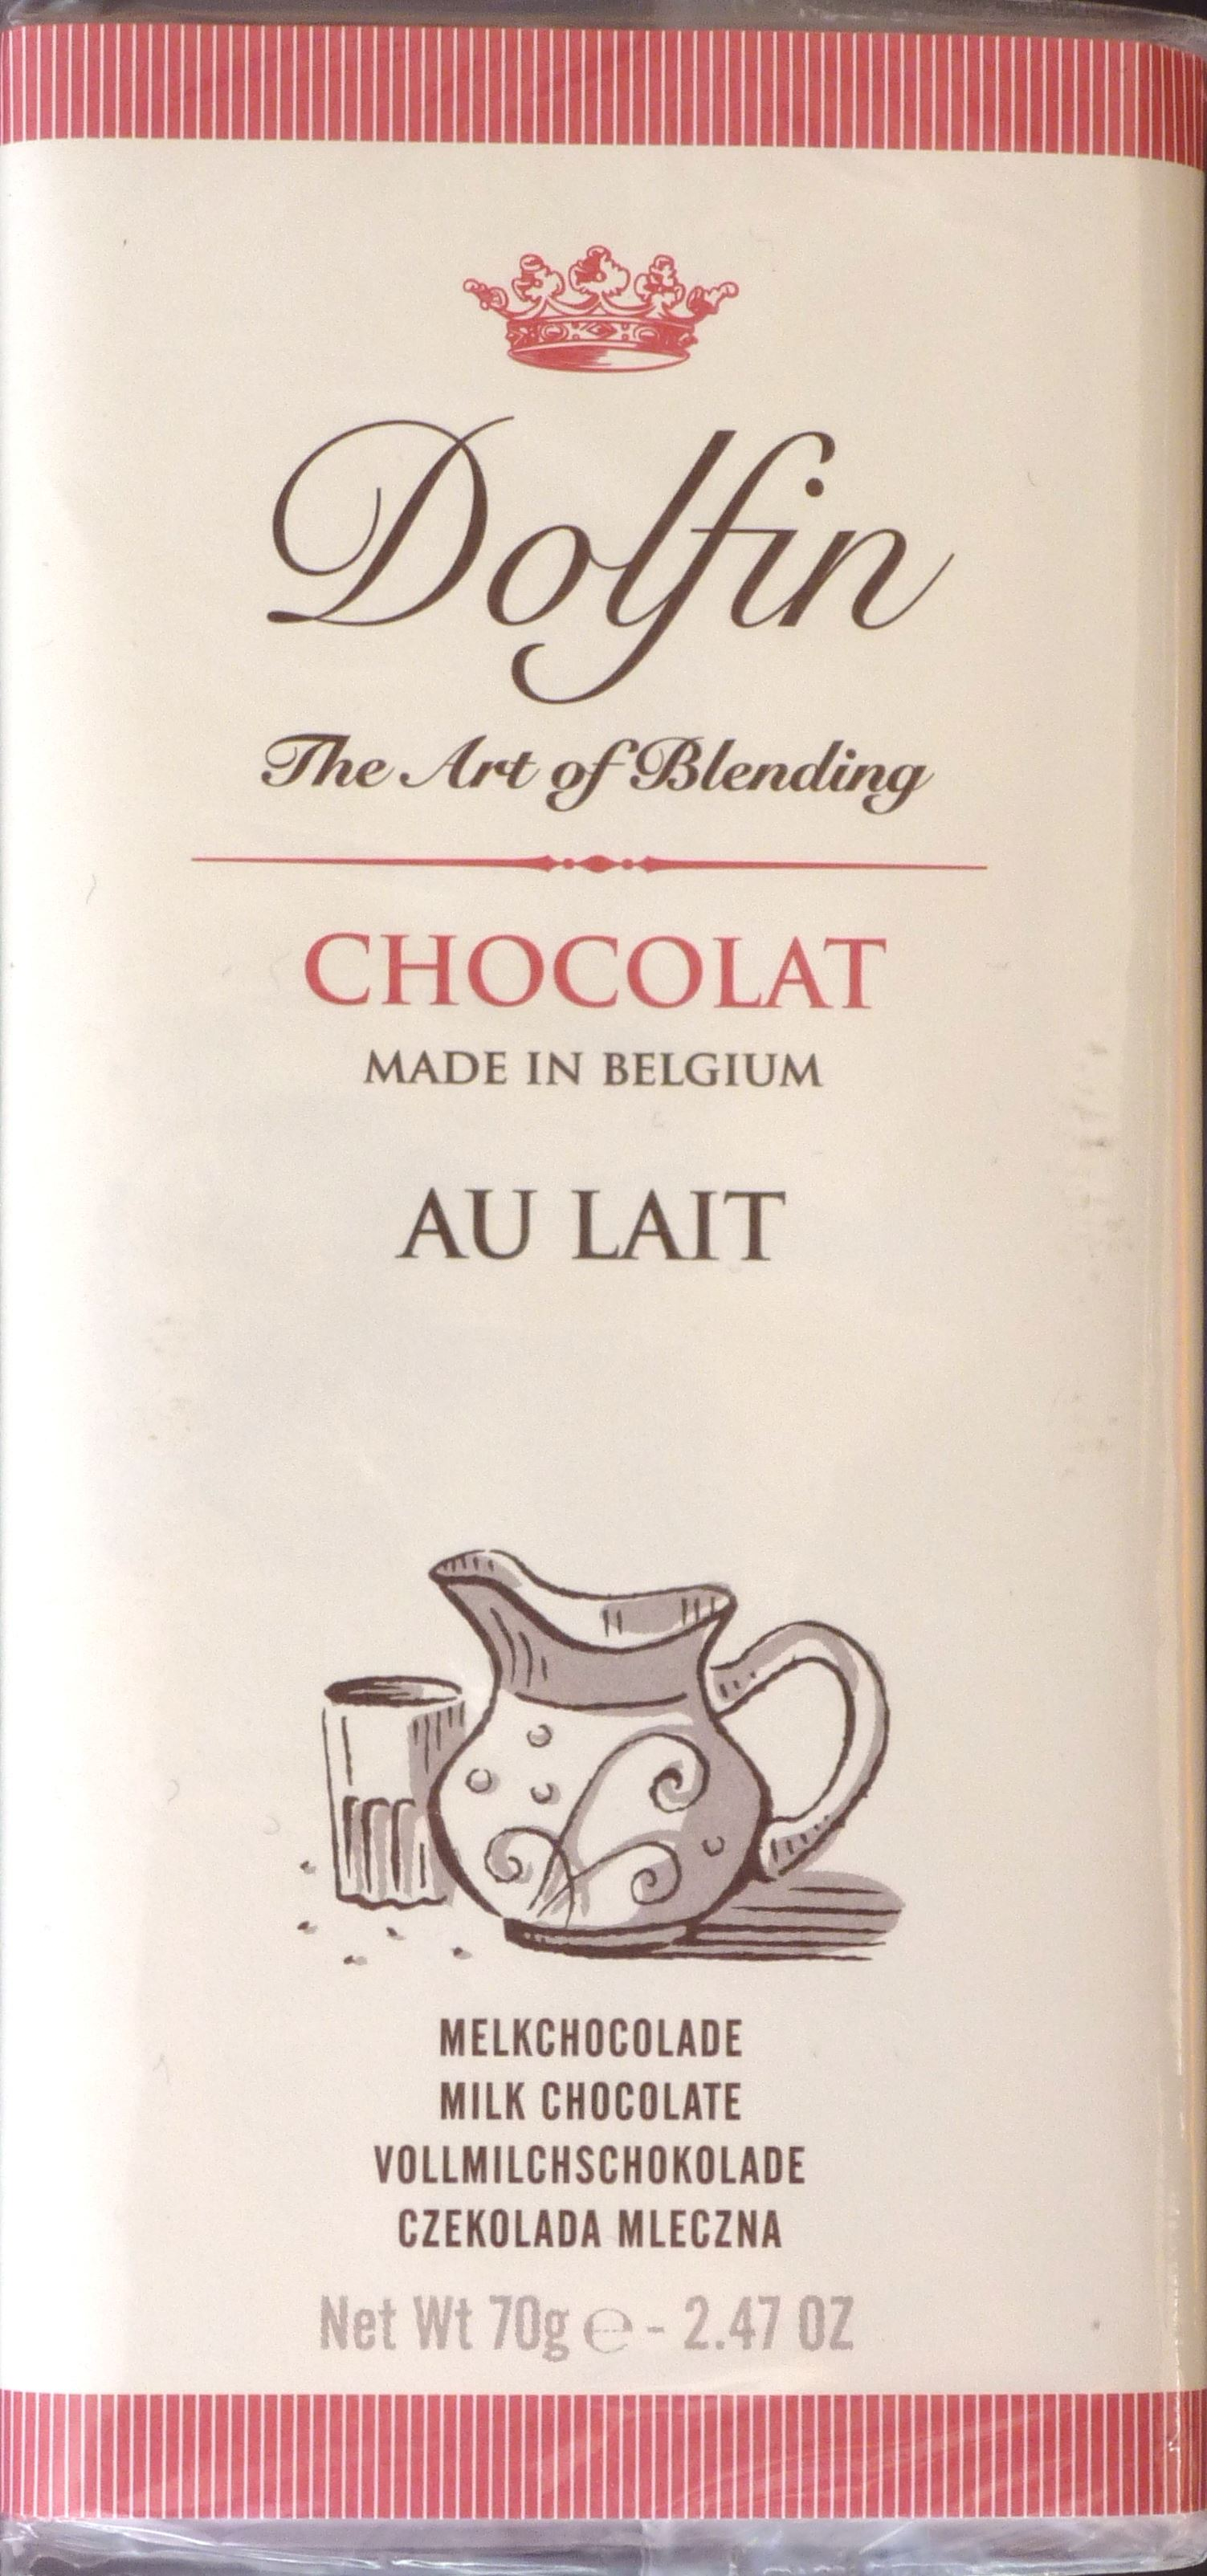 Packung Dolfin Chocolat au Lait